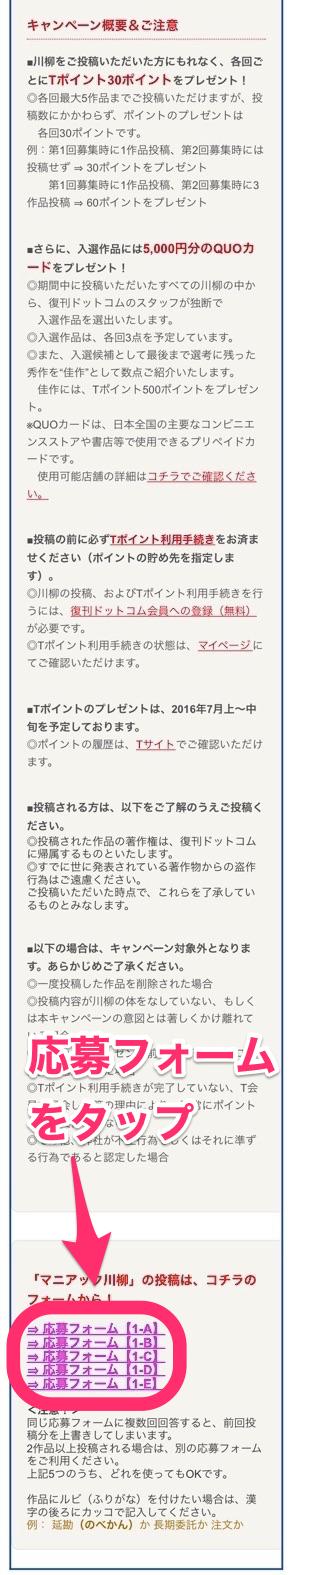 fukkan_sp_01b